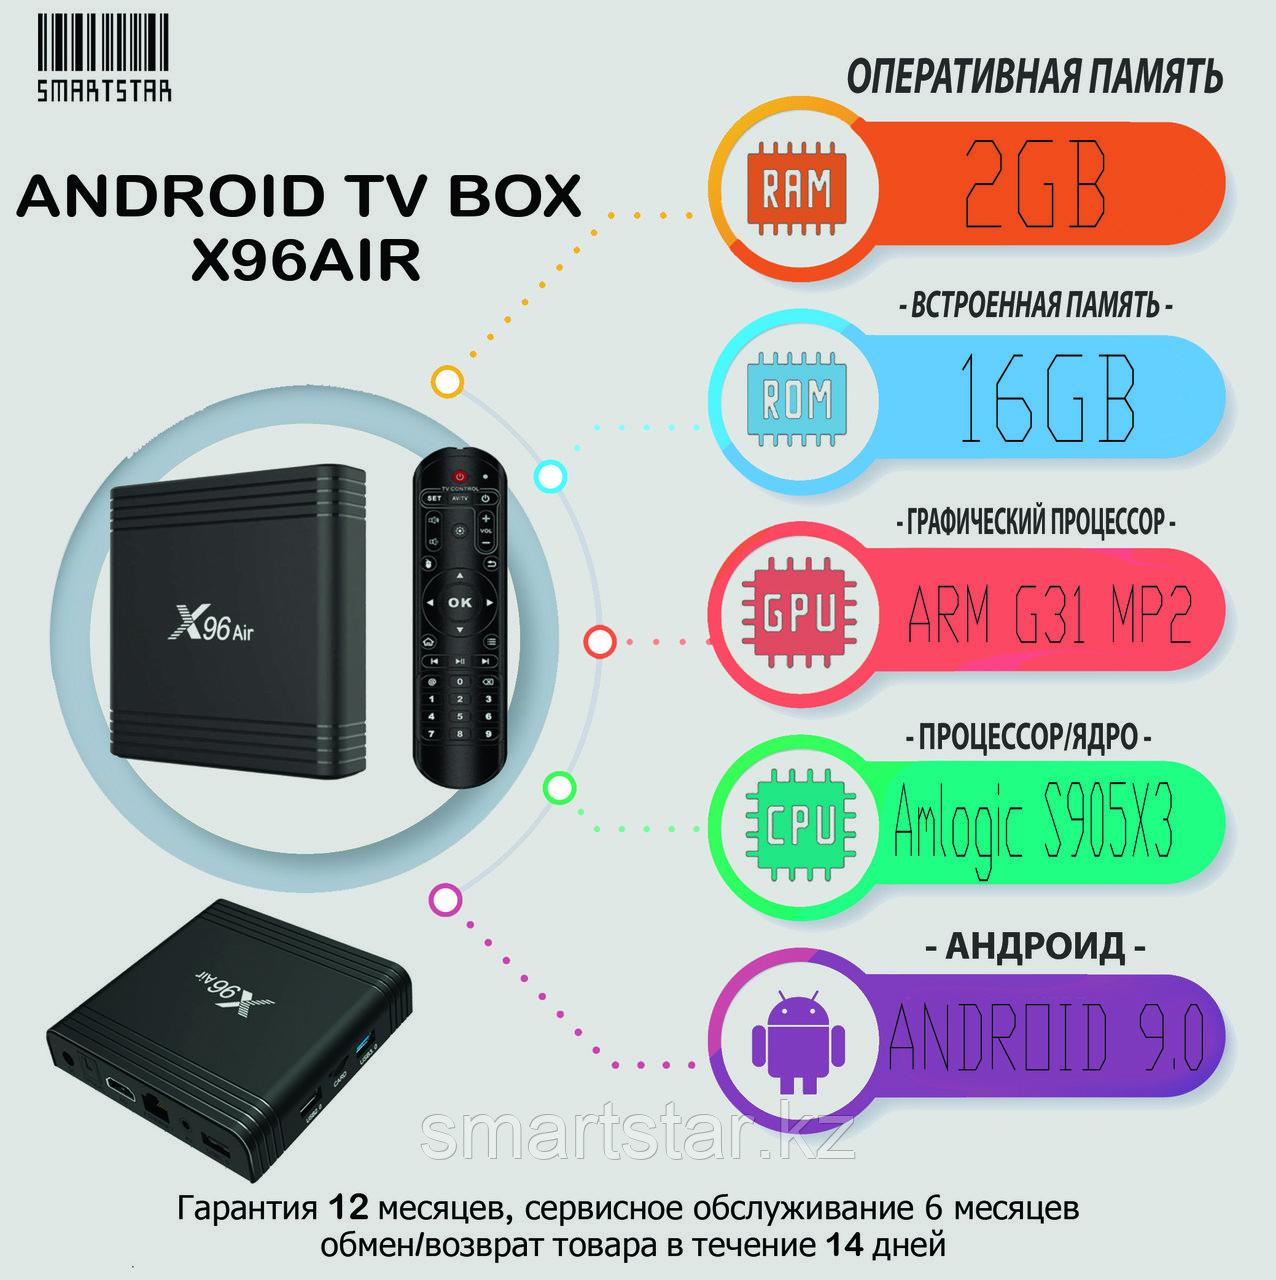 ANDROID TV BOX приставка X96AIR (2/16GB)